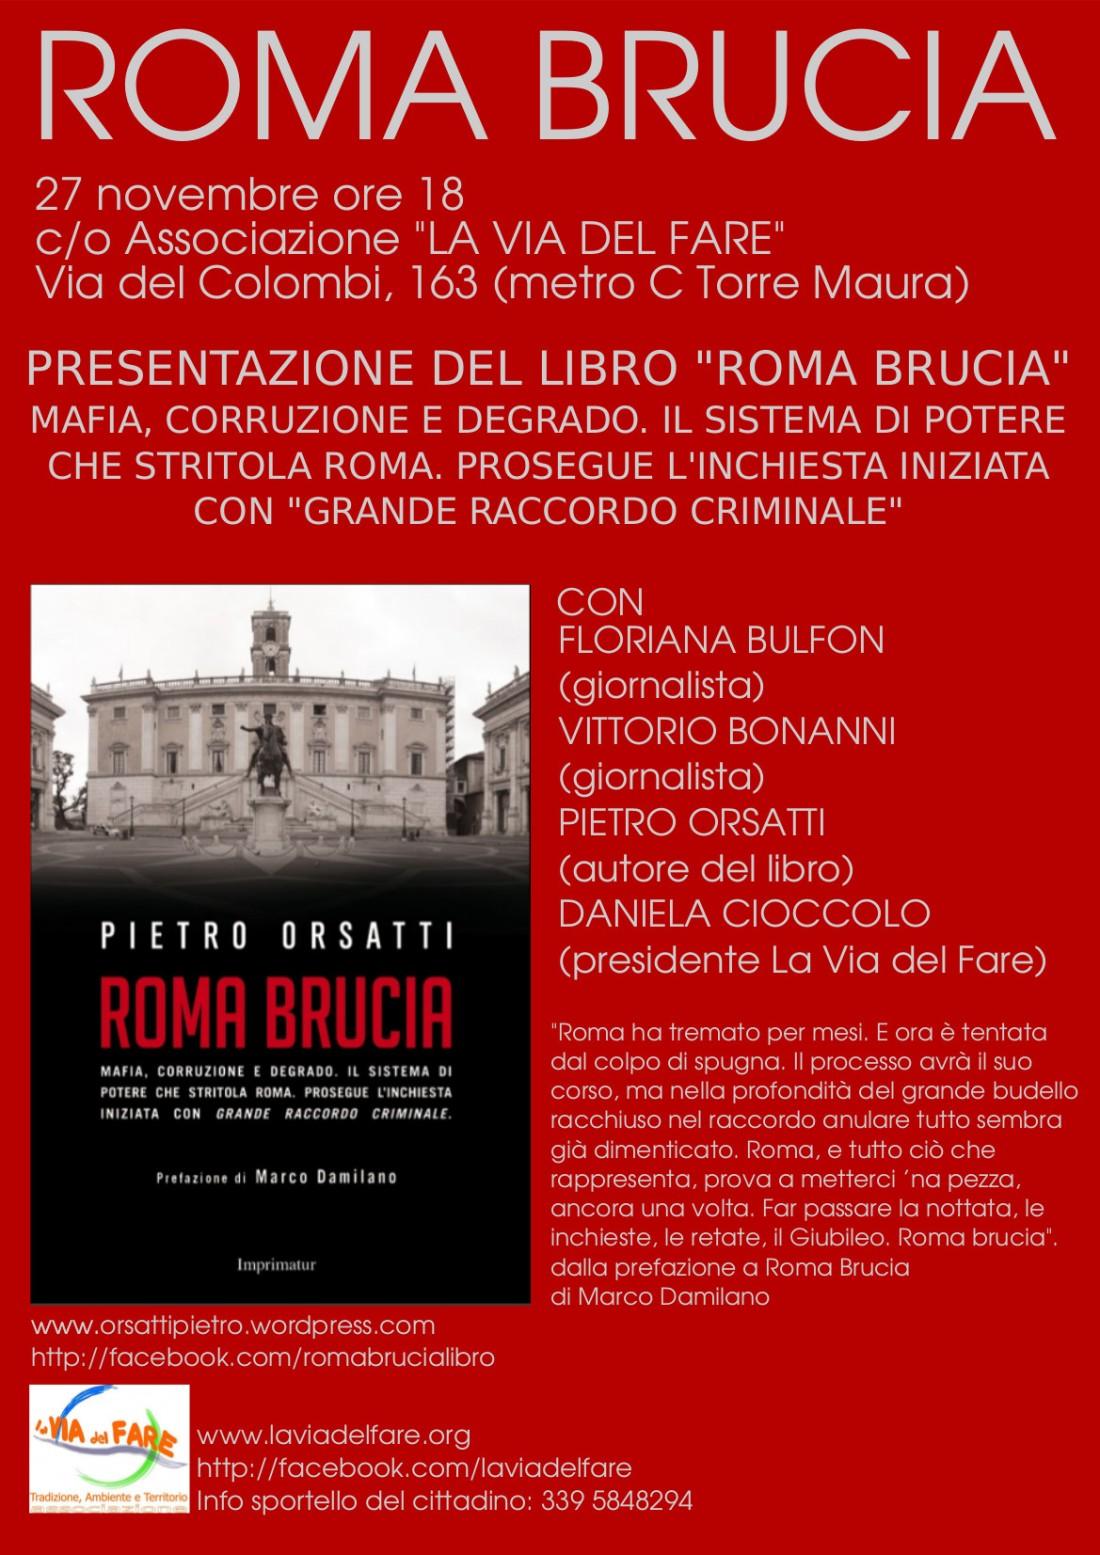 roma brucia 27 novembre Torre Maura